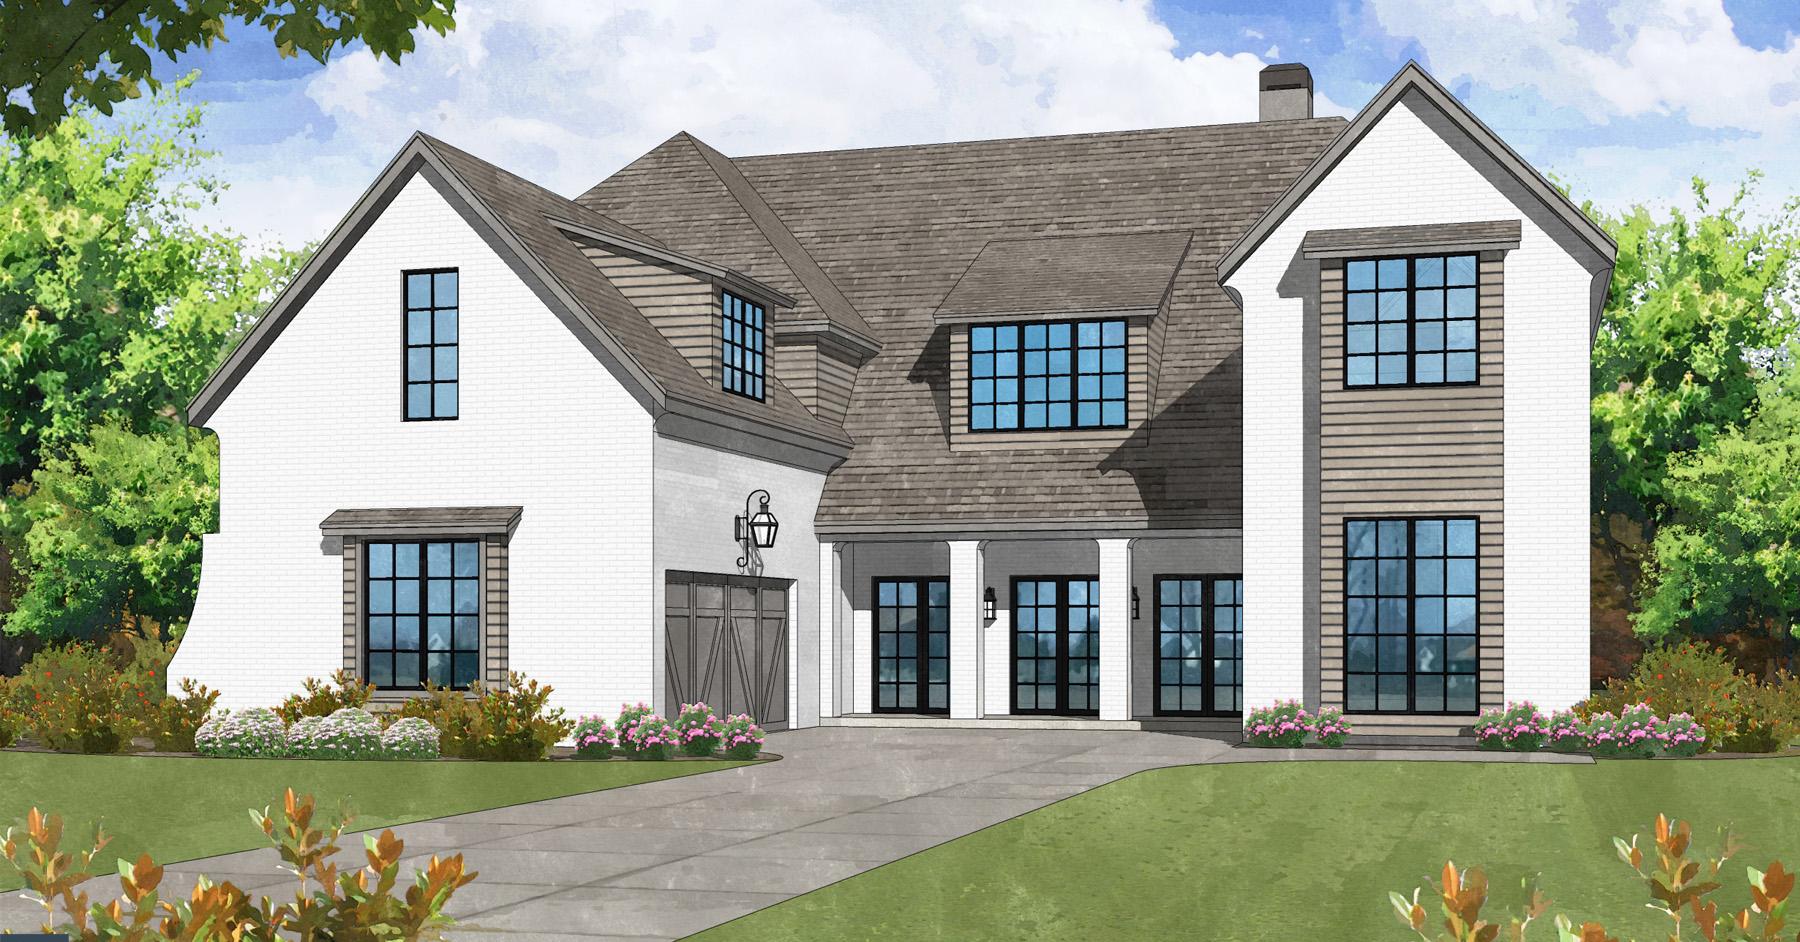 Hunters Creek Village  <br/>Custom Home<br>8443 Hunters Creek Dr, Houston, TX